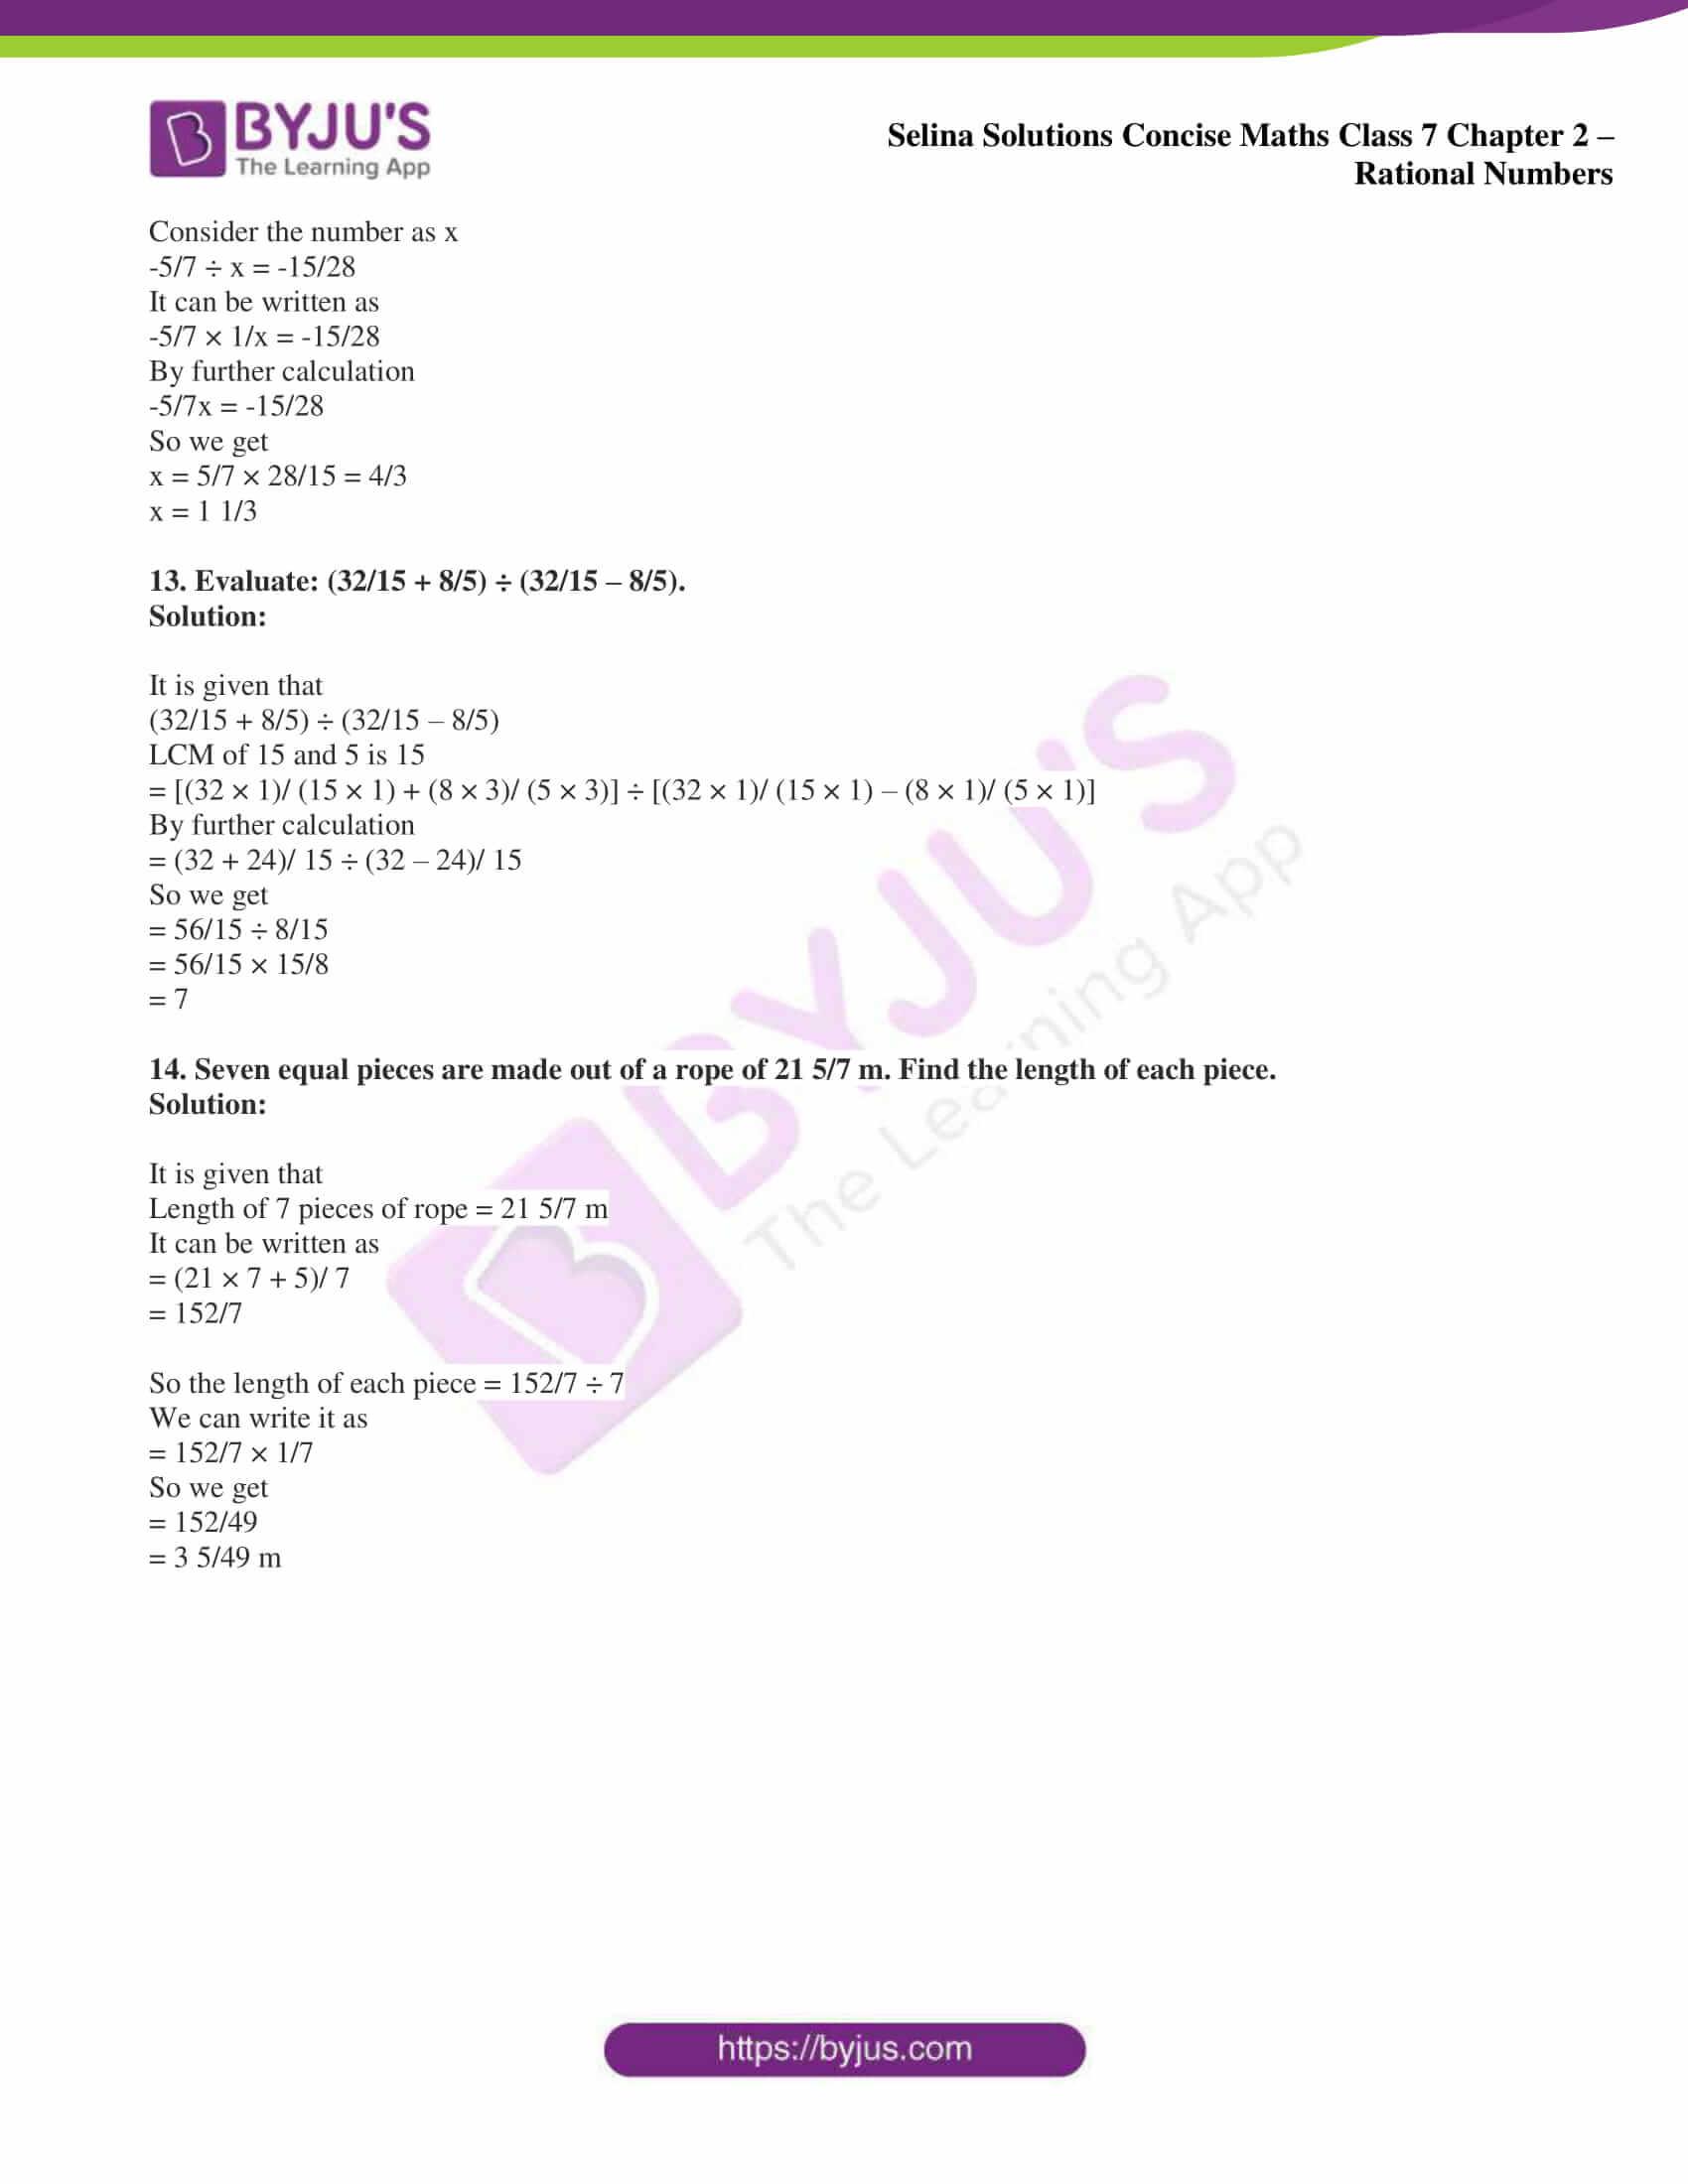 selina sol concise maths class 7 ch2 ex 2d 11